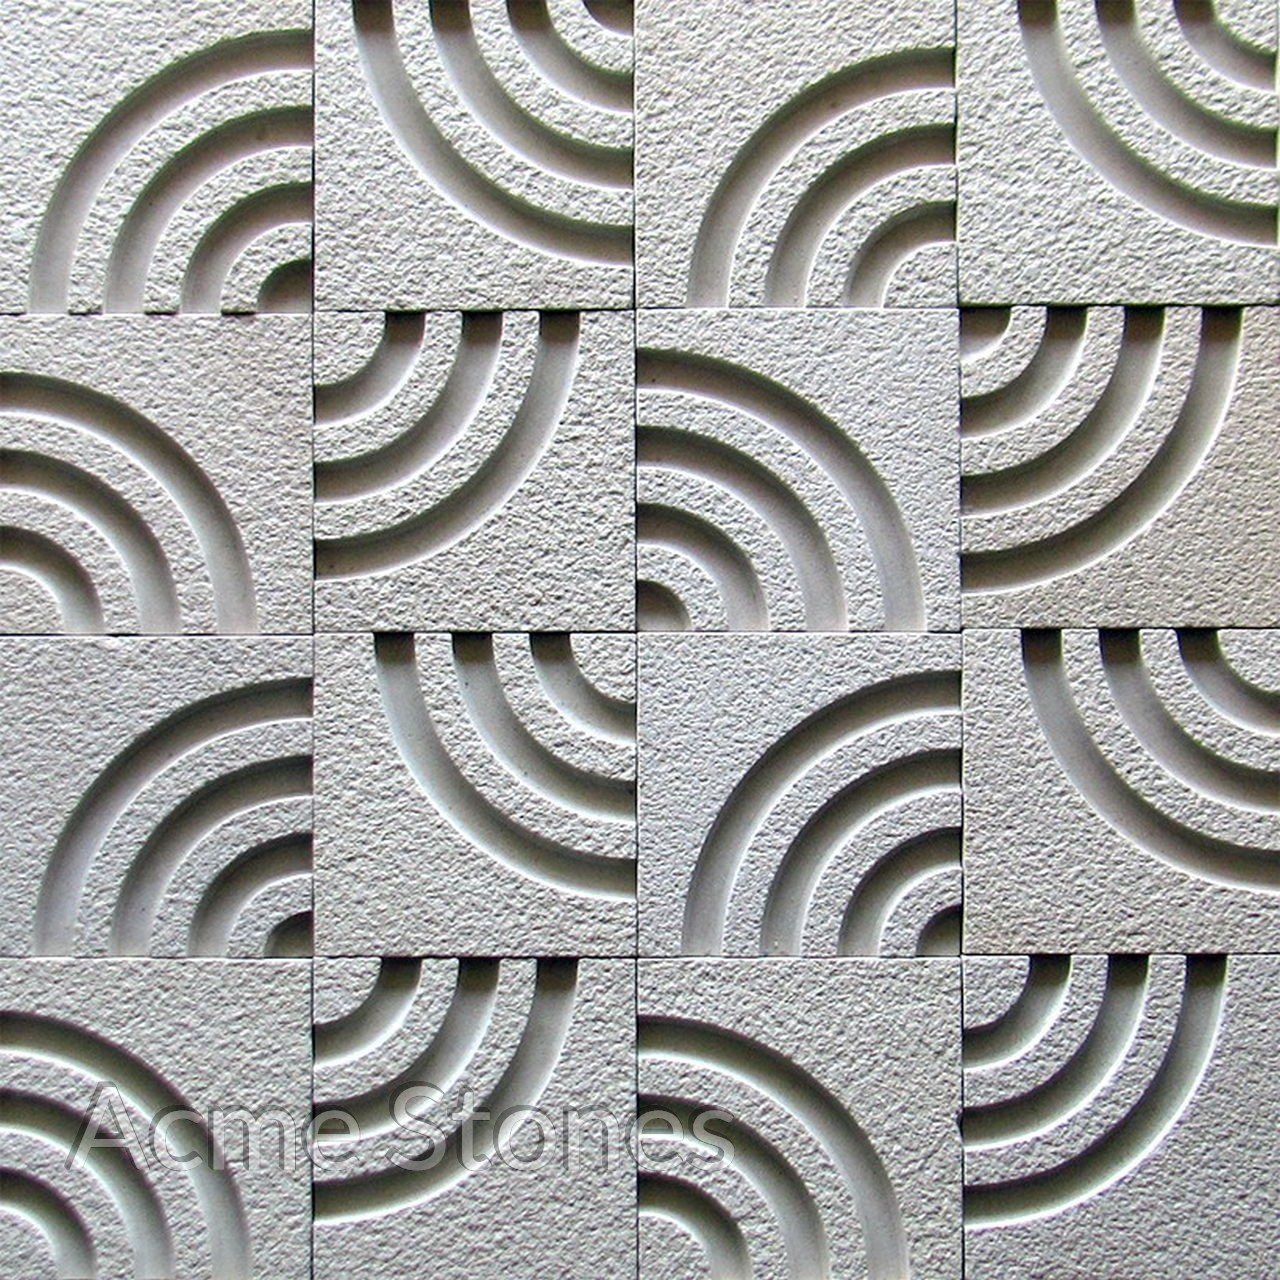 CNC Mint Concentric Circles